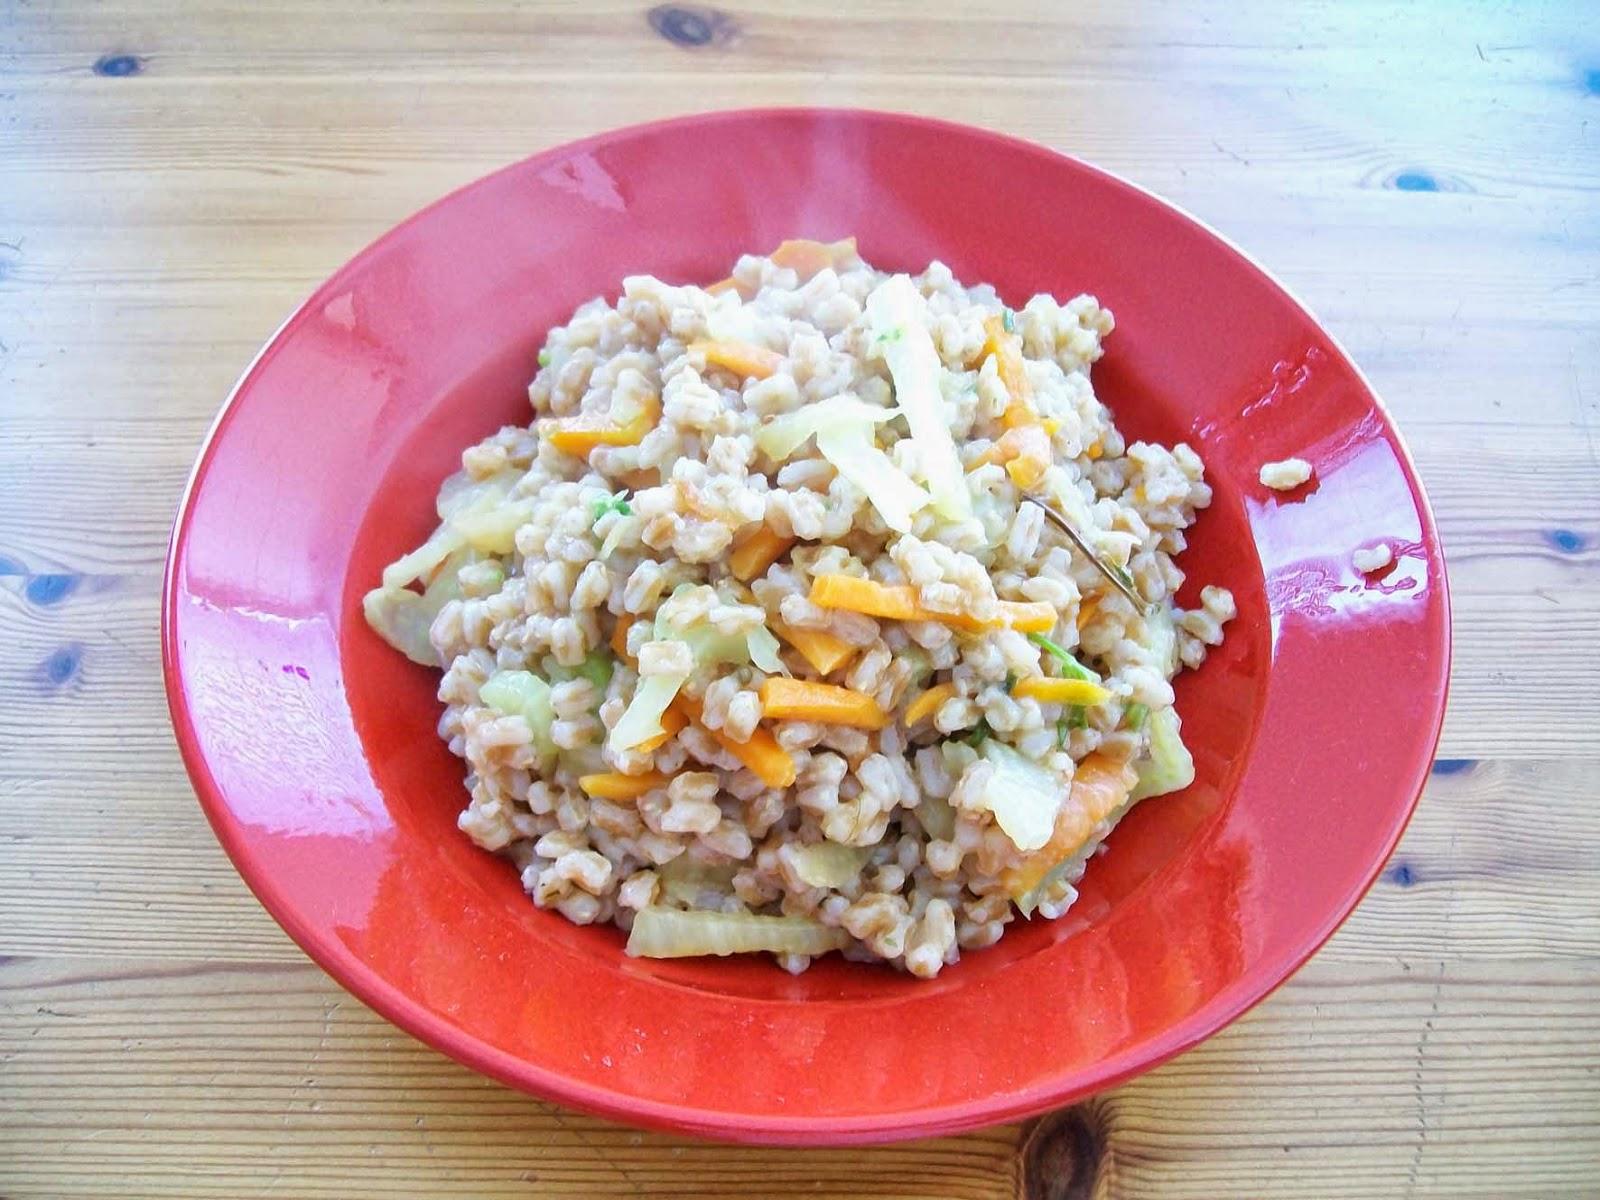 Dinkel mit Gemüse - vegan - Hauptspeise